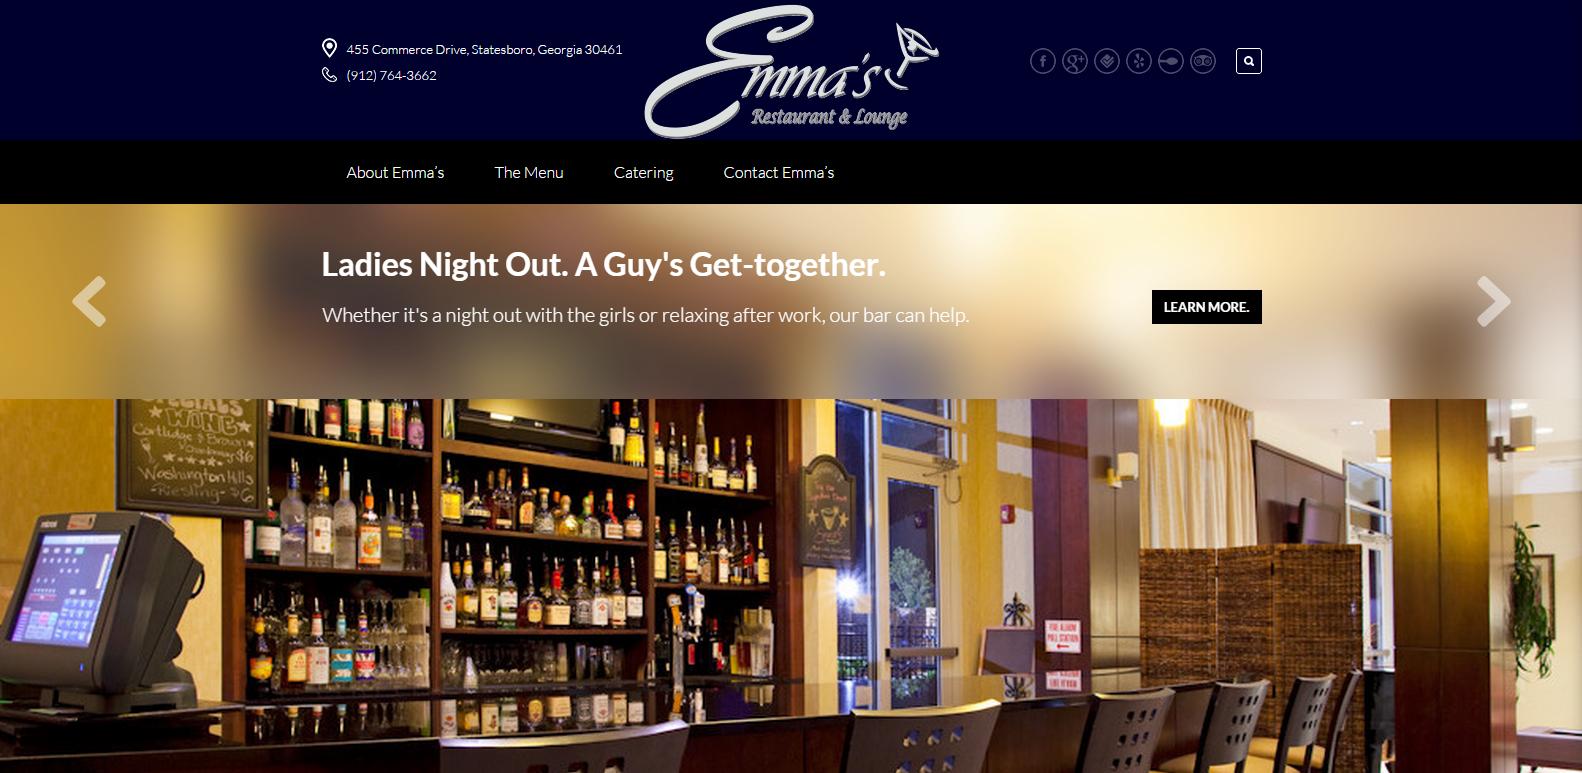 Emma's Restaurant & Lounge